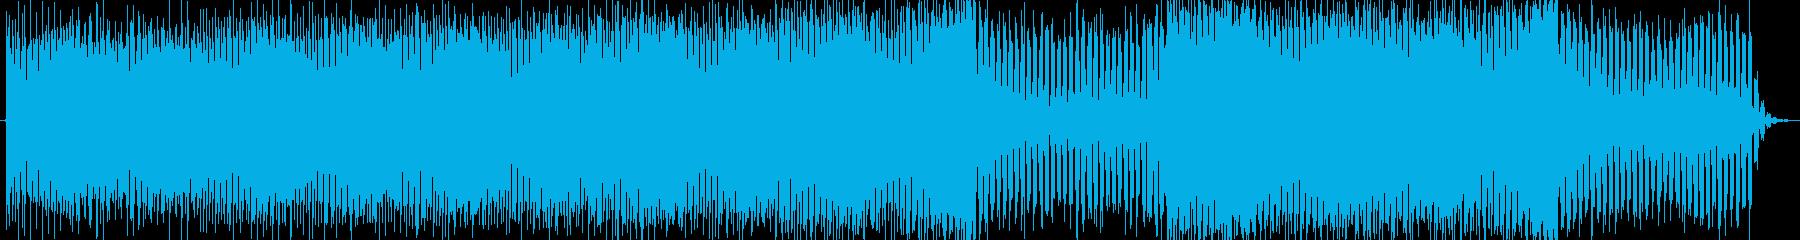 Ambient Houseの再生済みの波形